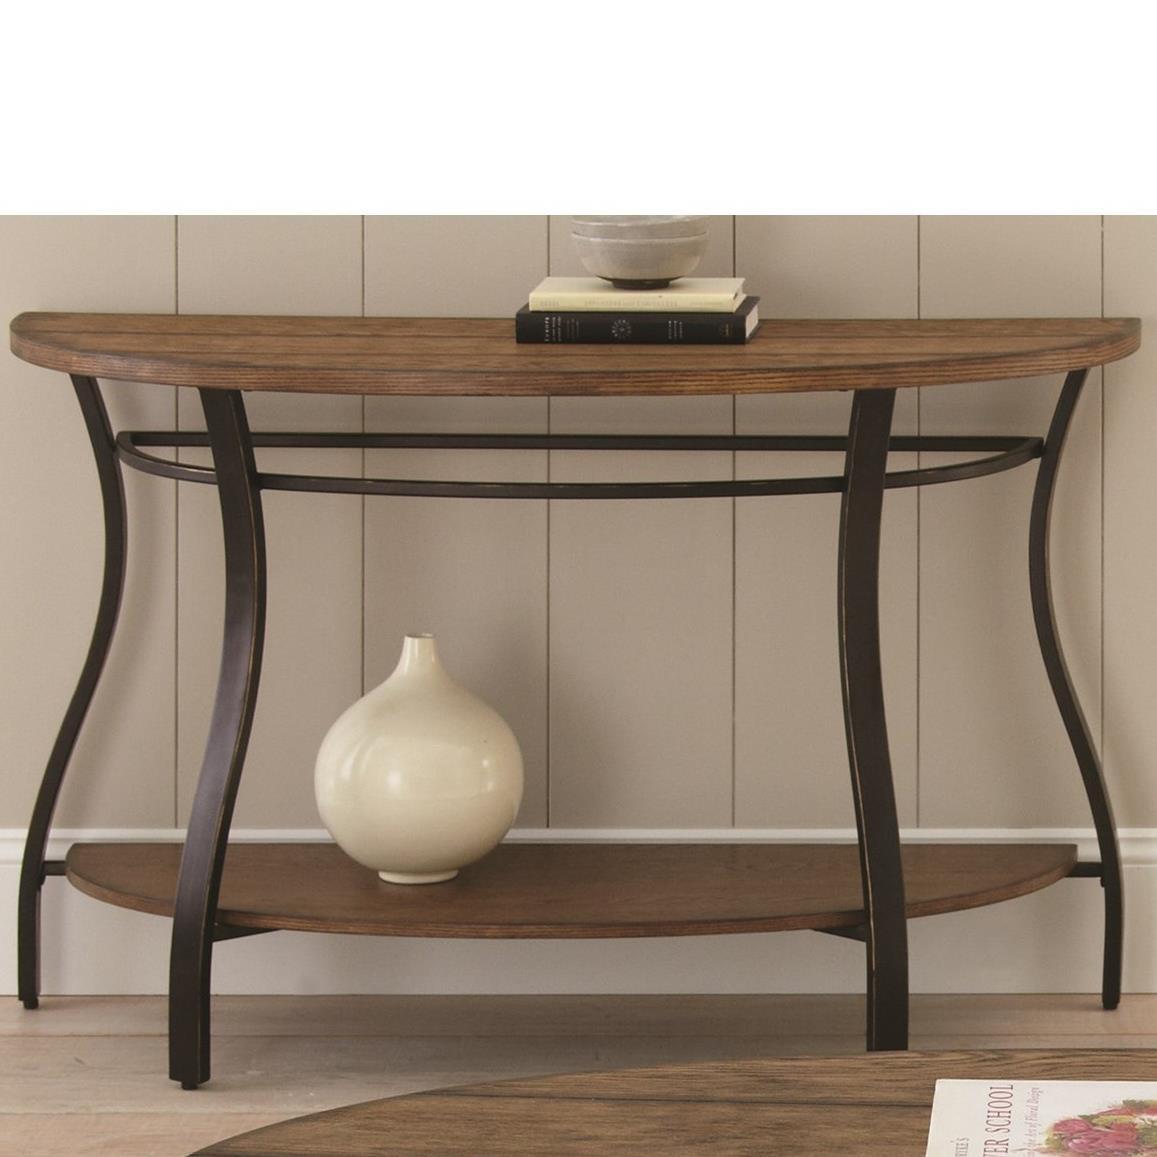 Transitional Sofa Table with Bottom Shelf